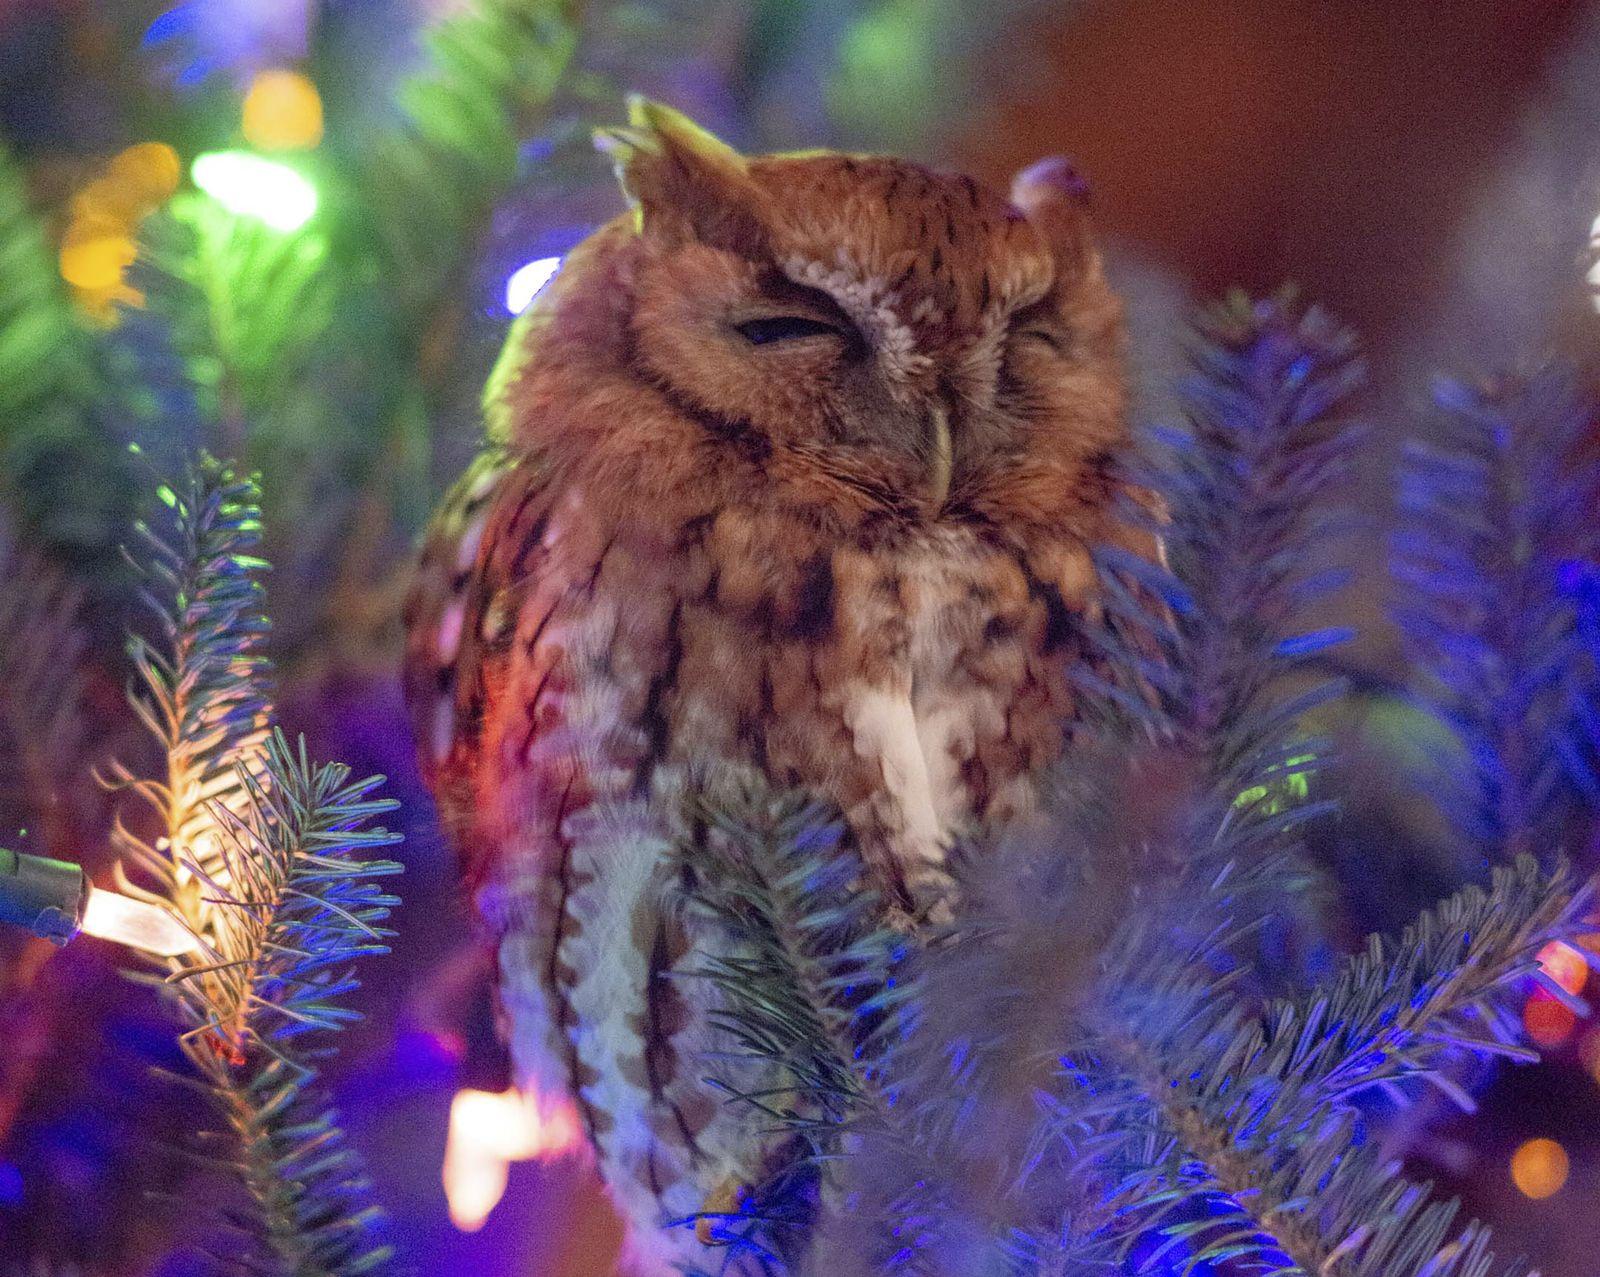 Eule/ Tannenbaum/ Christmas tree/ Atlanta